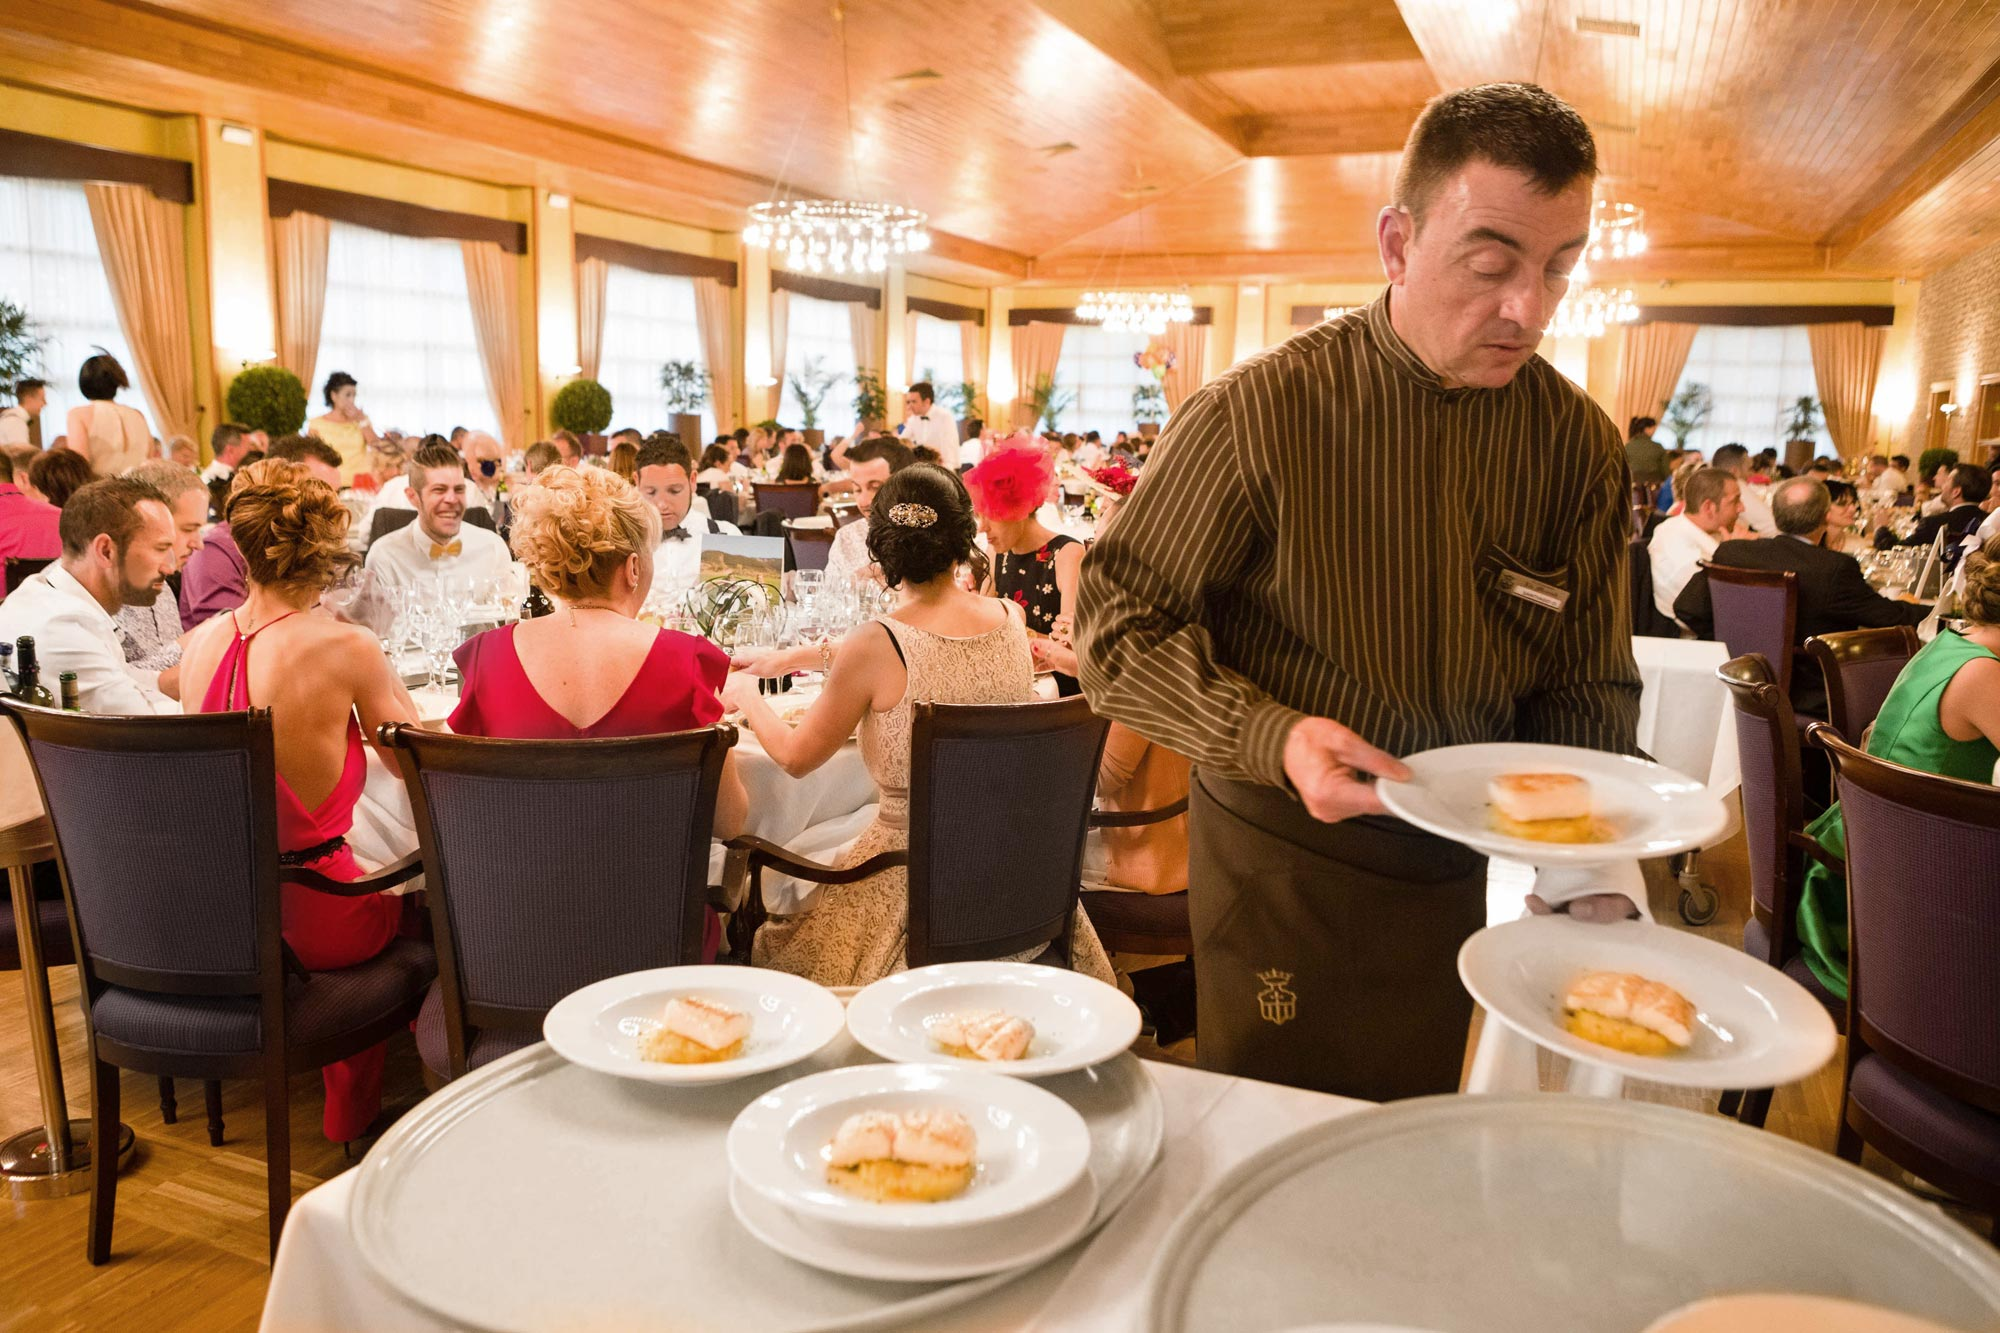 Boda top 5 - banquete